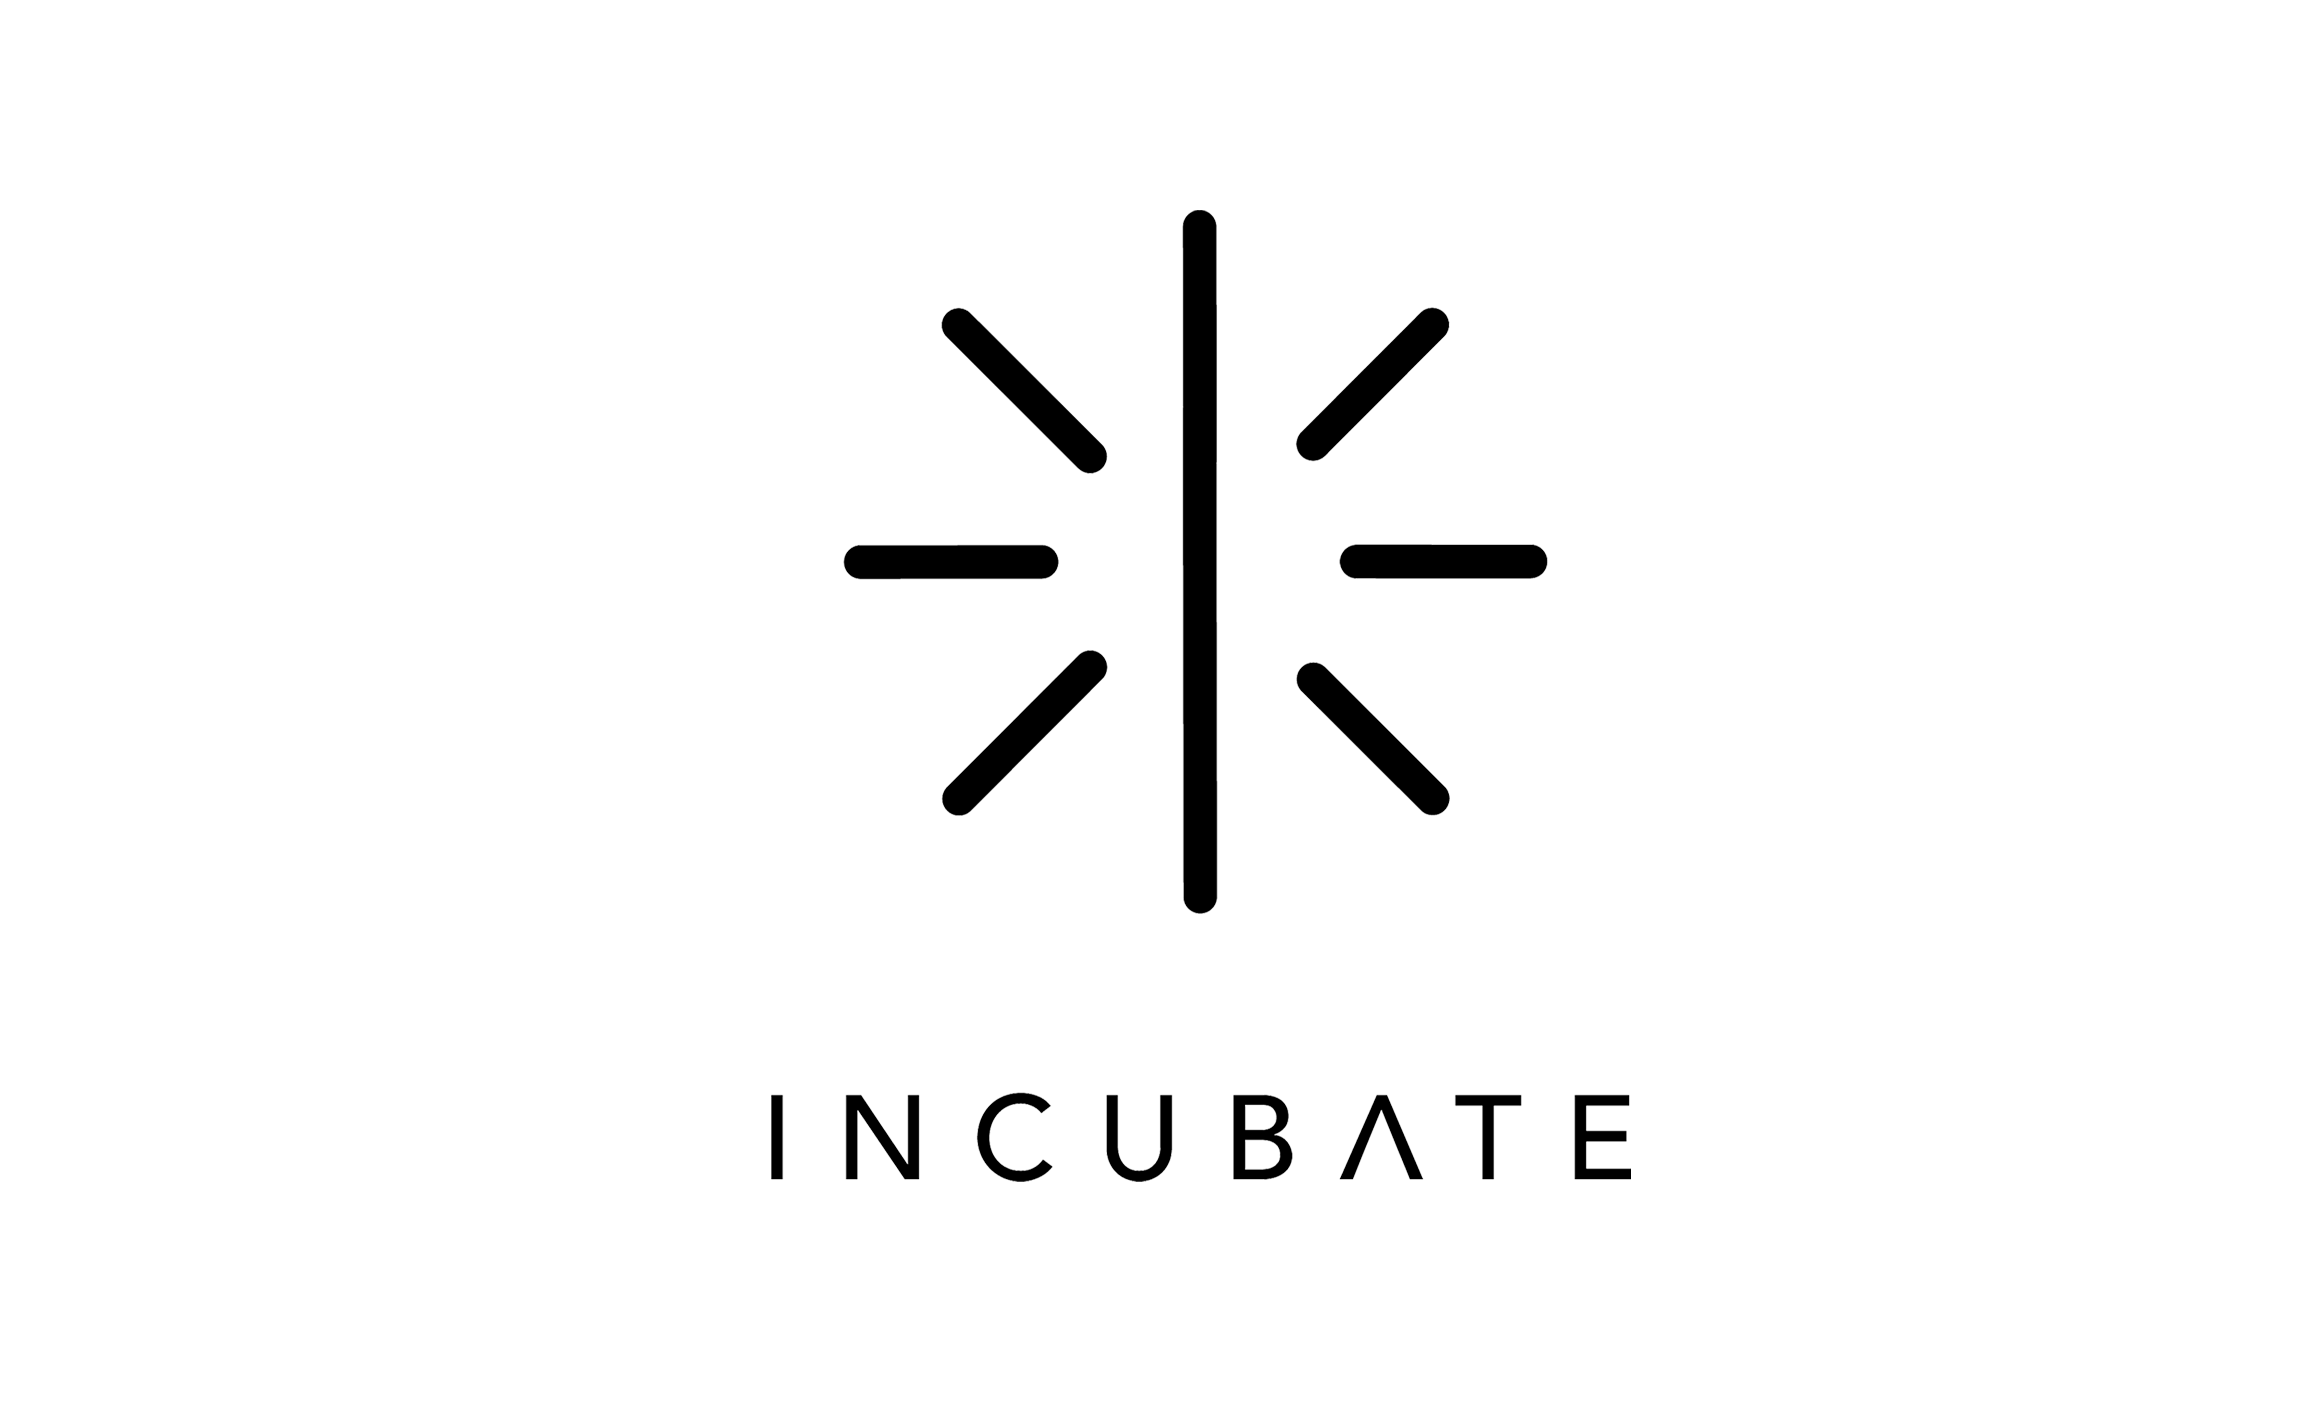 Launch You Incubate